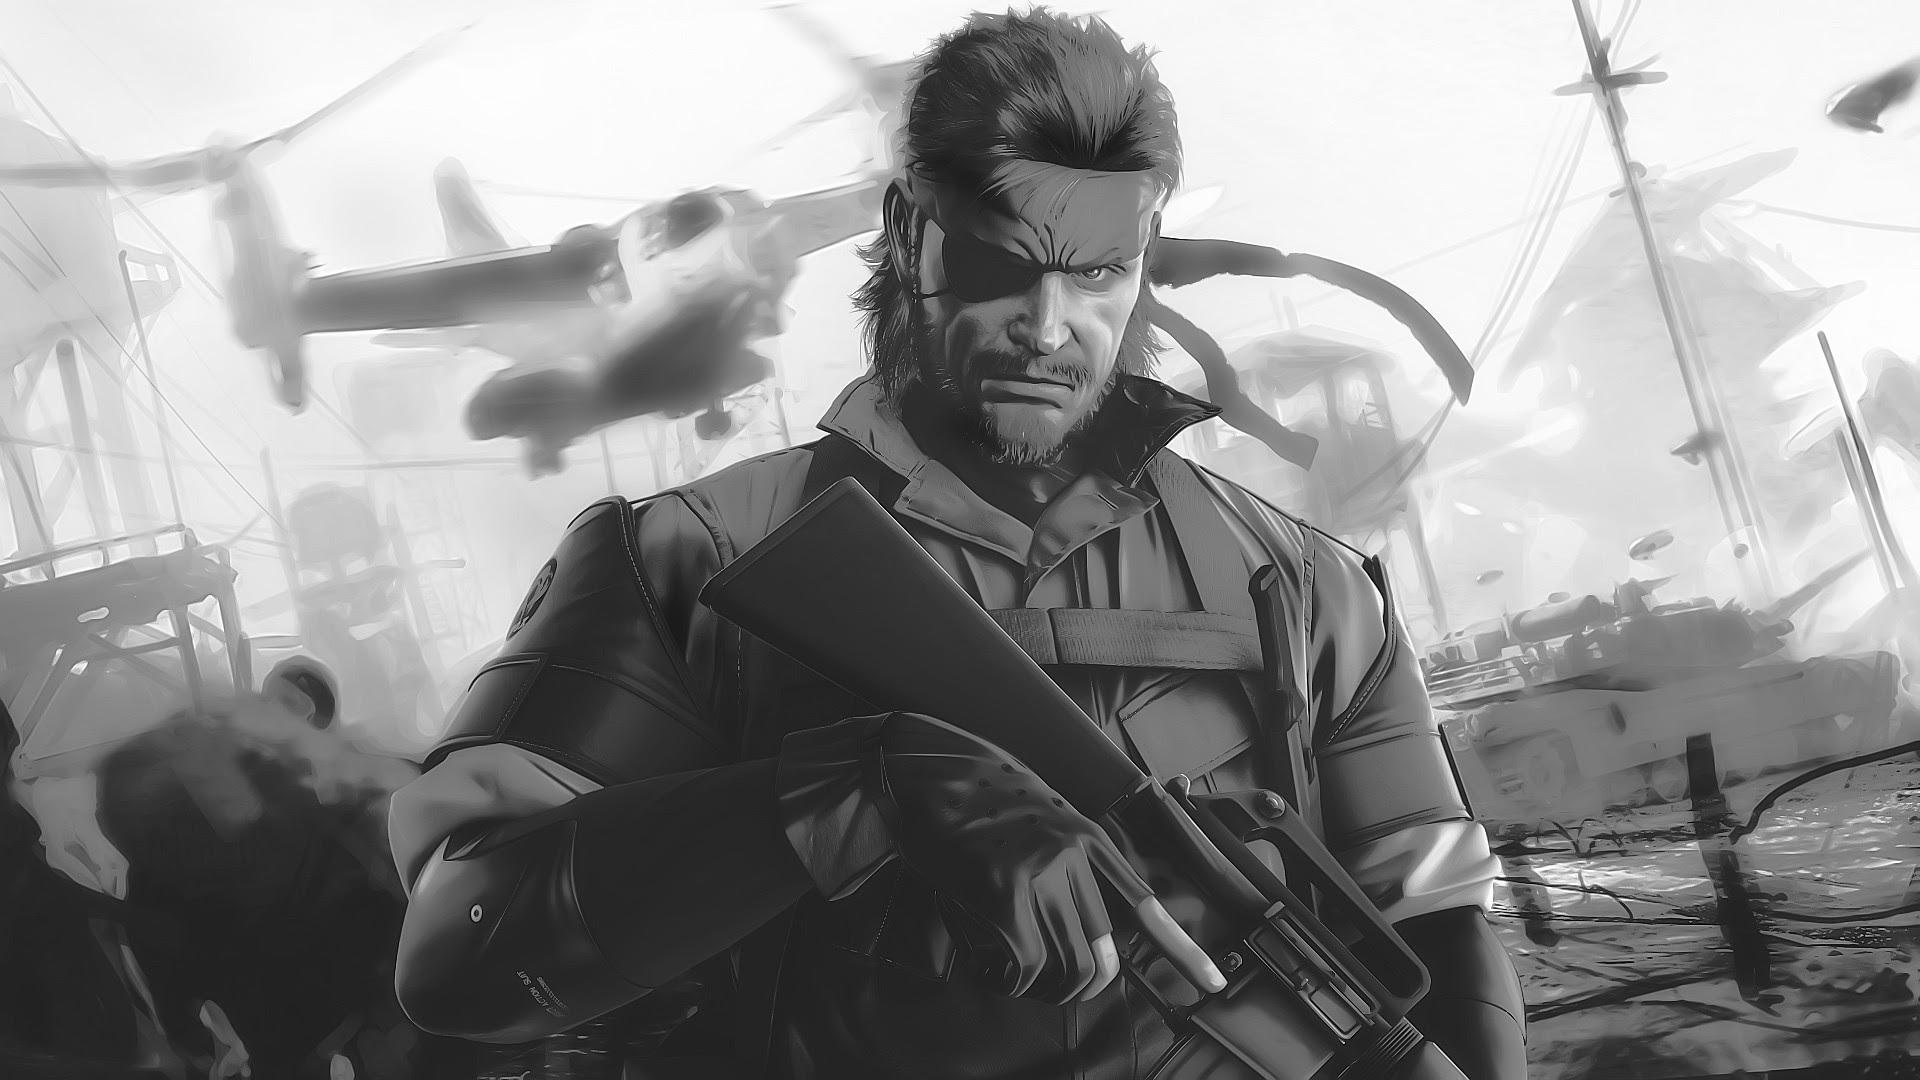 Metal Gear Big Boss Wallpaper 83 Images